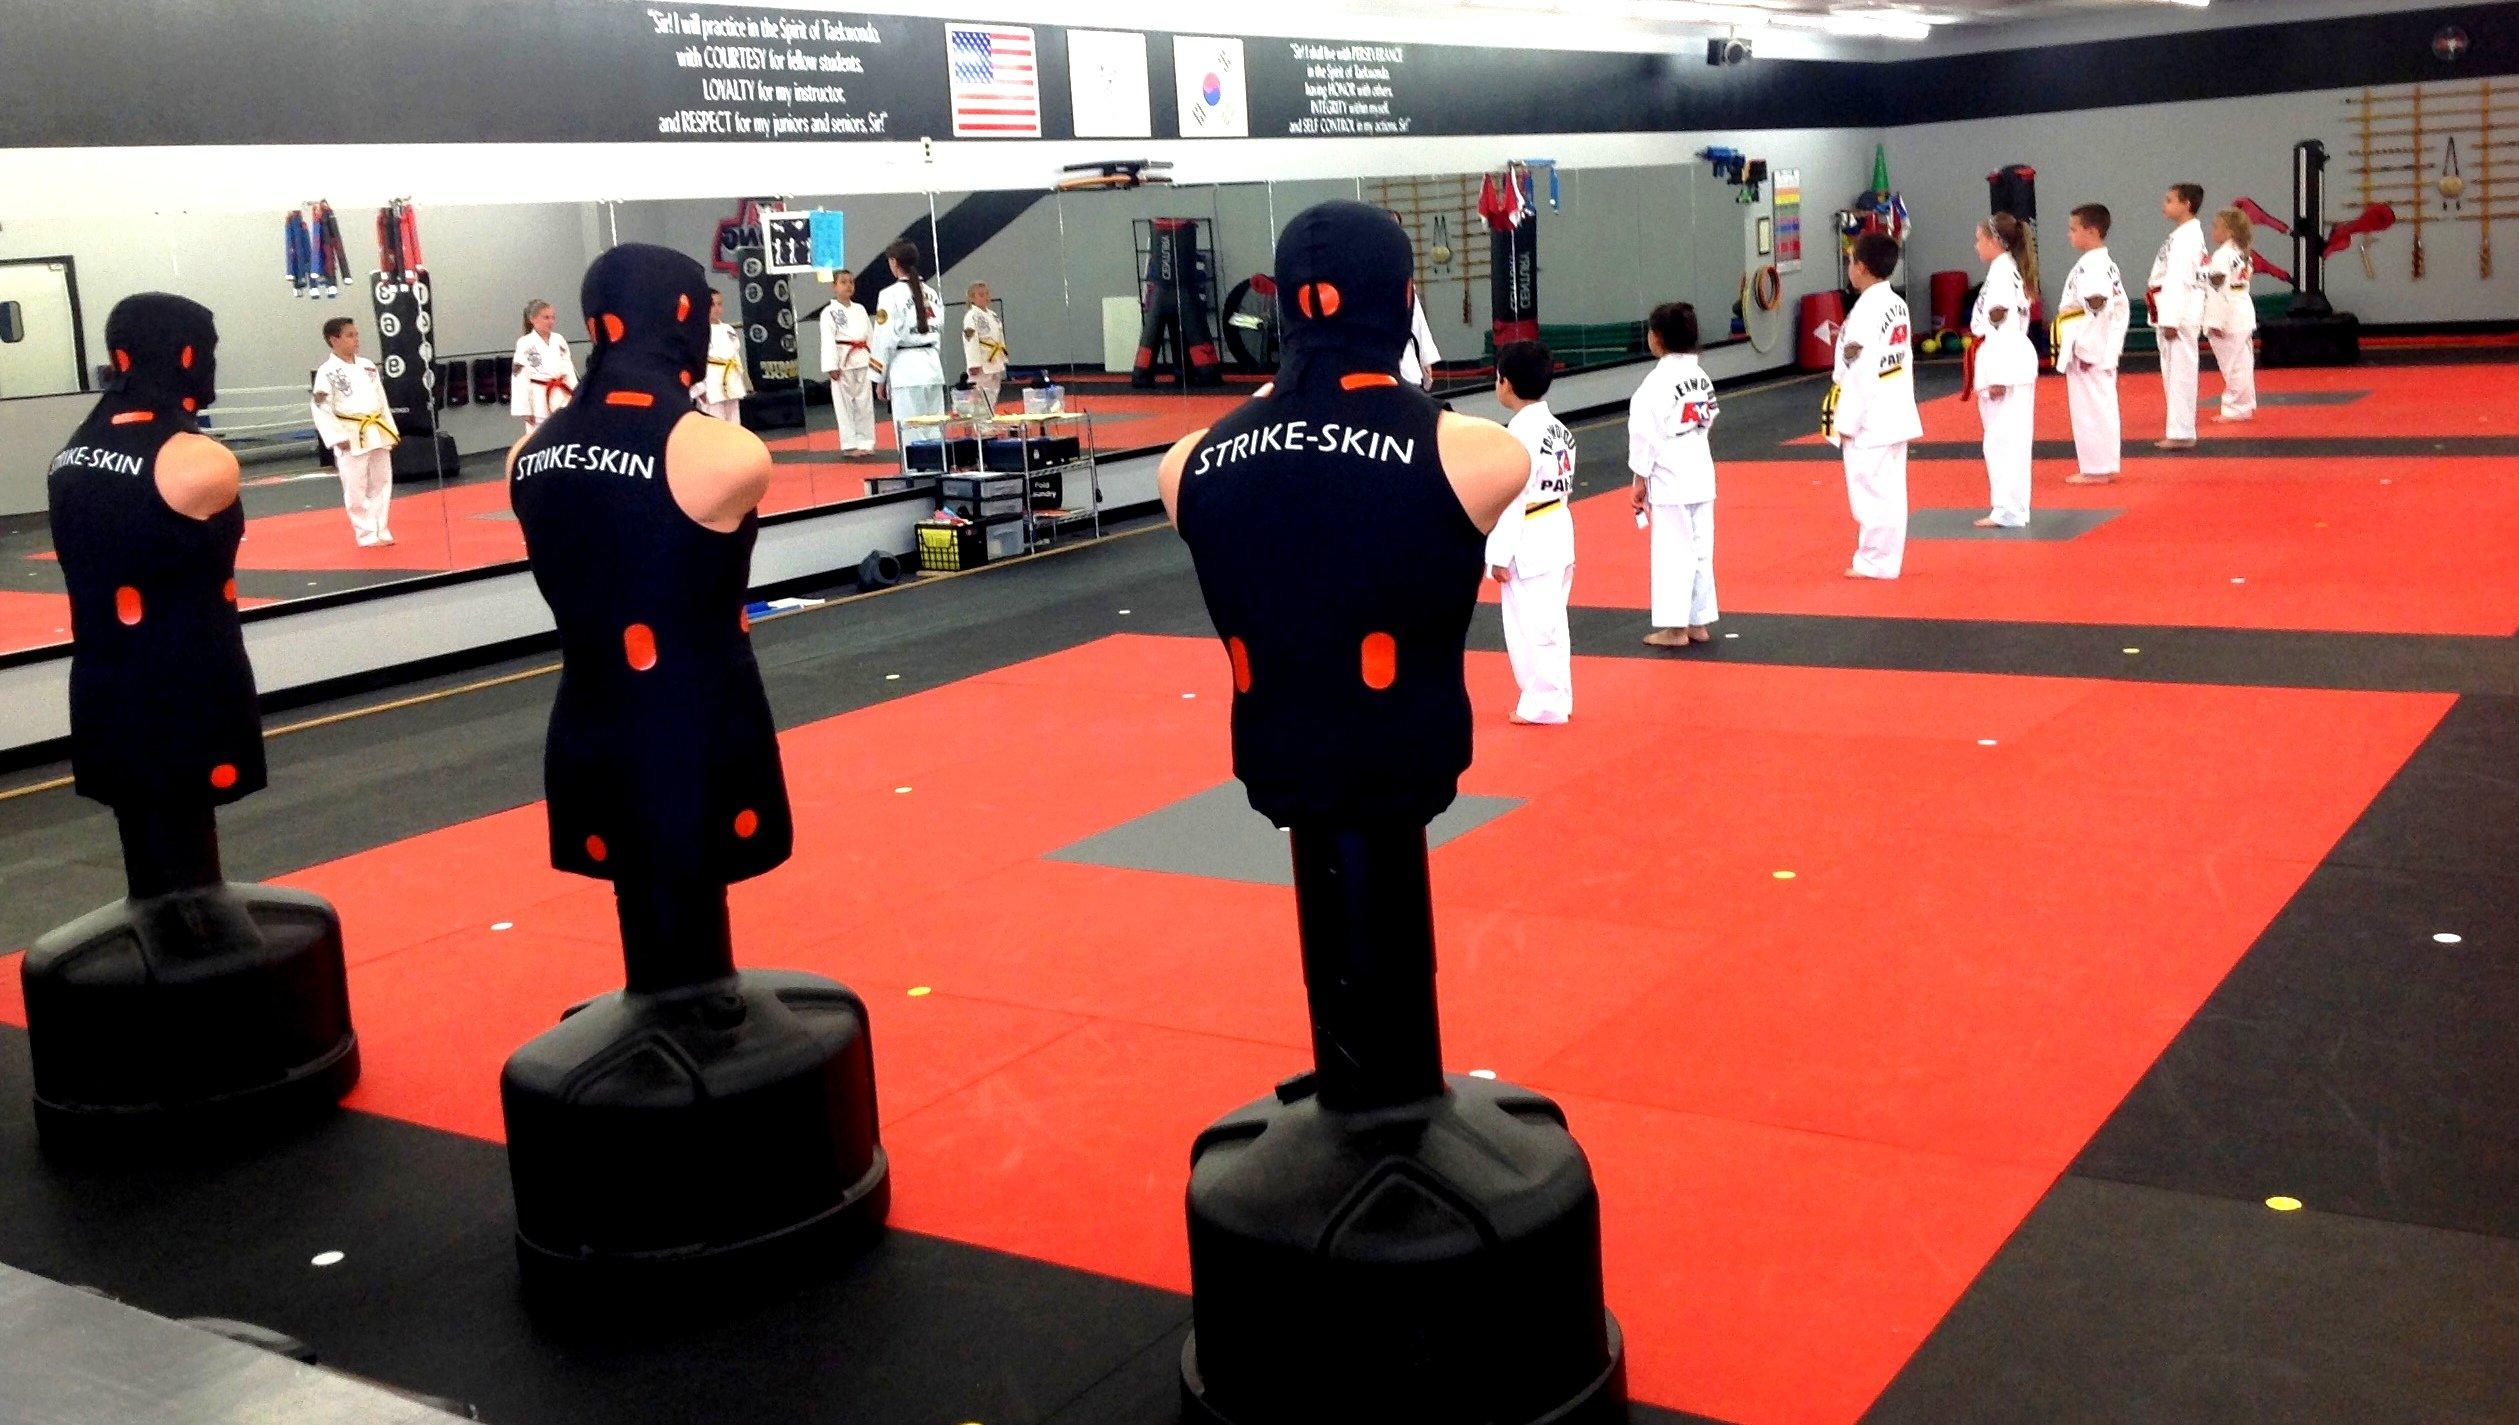 Strike-Skin Self Defense Training Aide ***BOB Punching Bag NOT Included by Strike-Skin (Image #6)